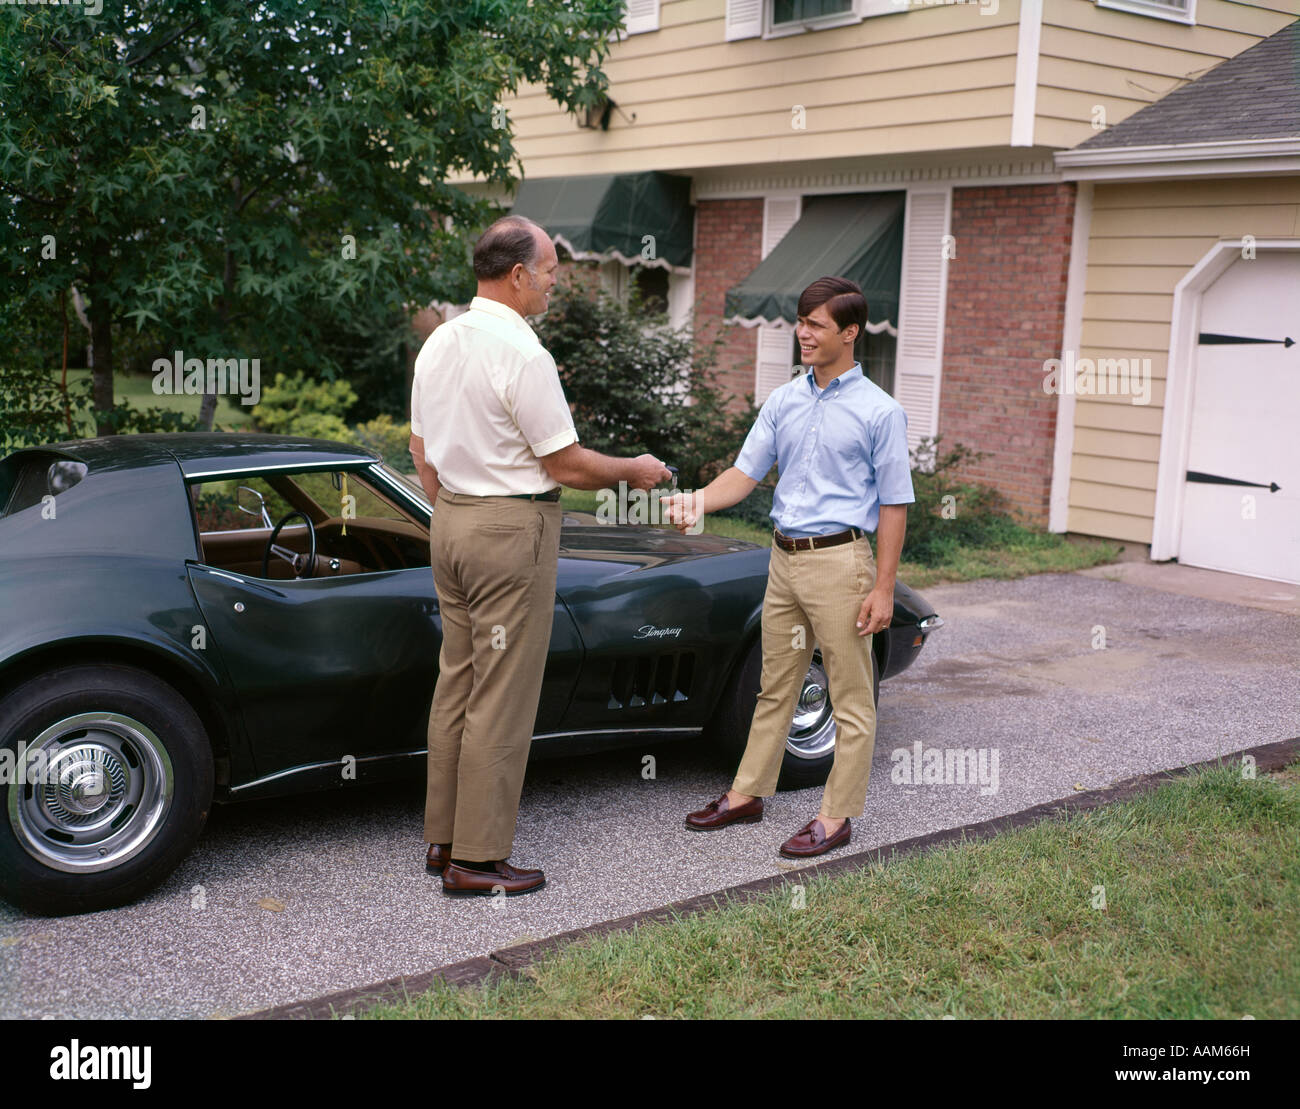 1970s FATHER HANDING TEENAGE SON KEYS TO FAMILY CAR MAN